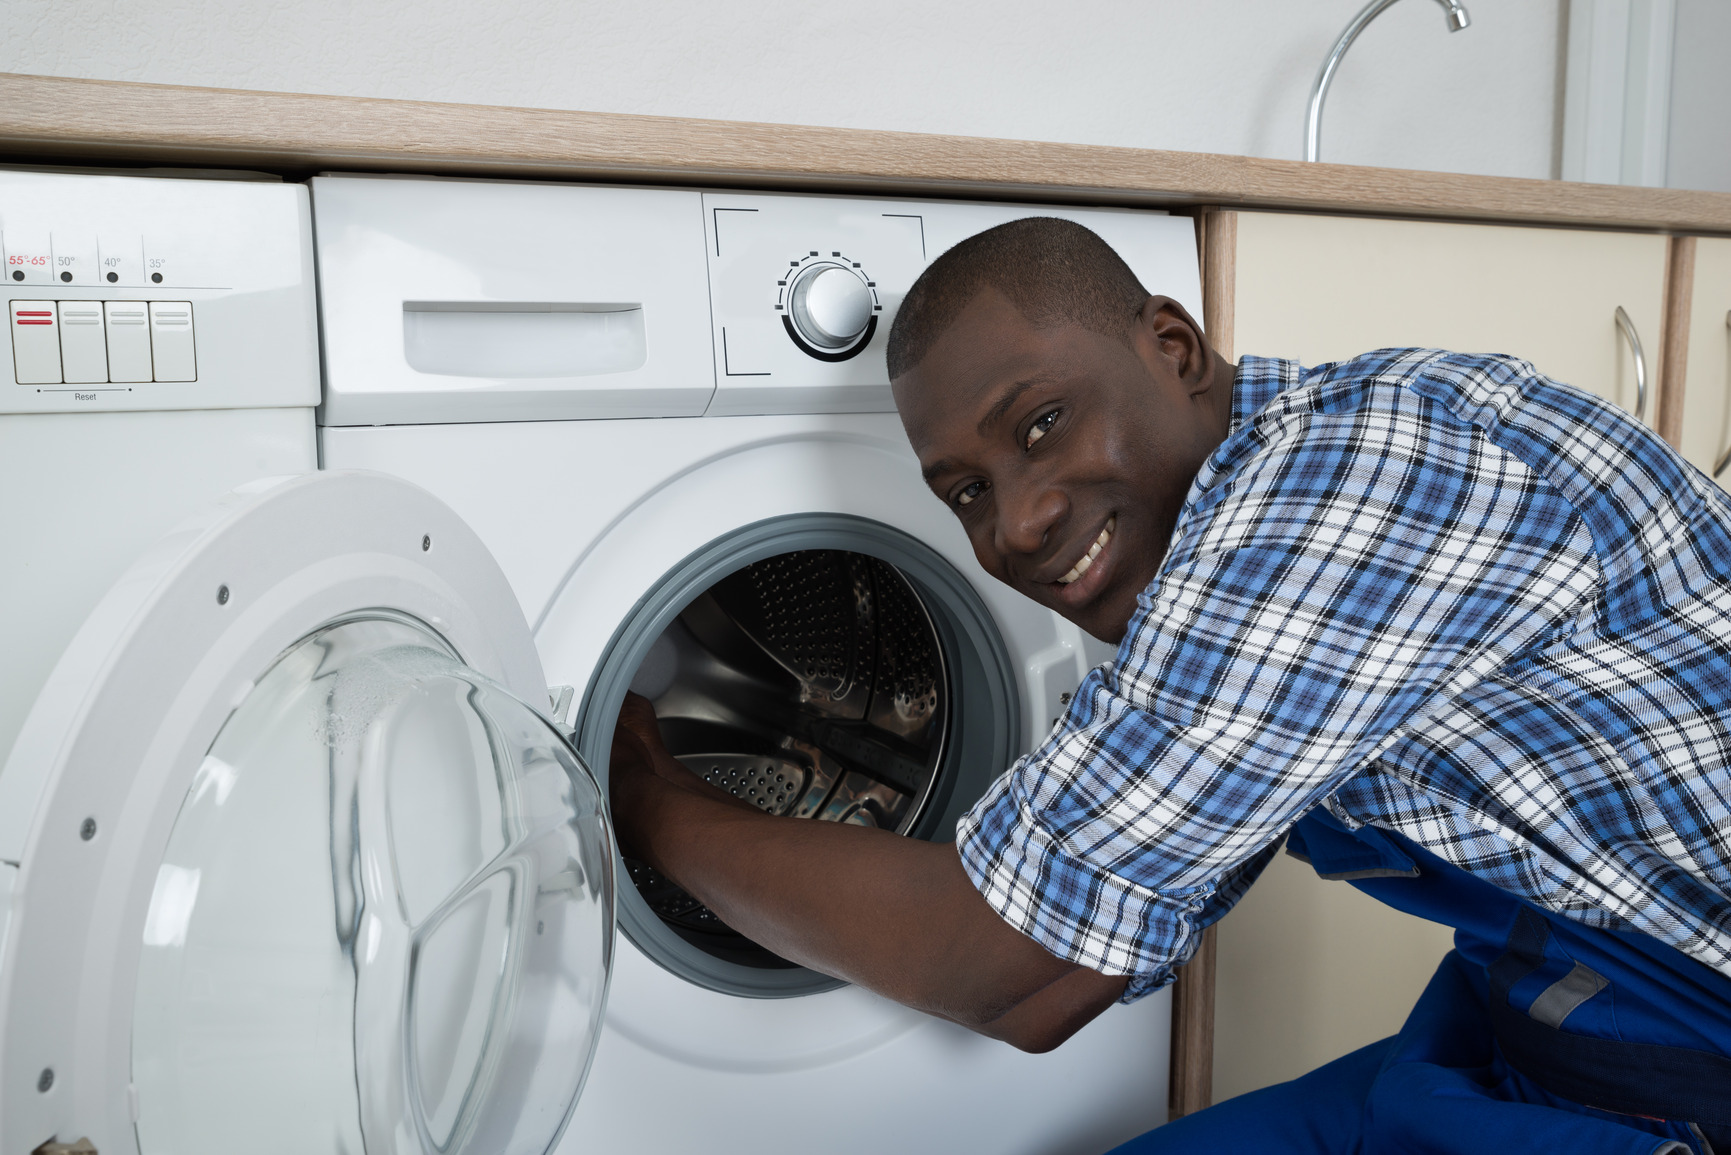 Appliance Repair Training Online Self Paced School Very